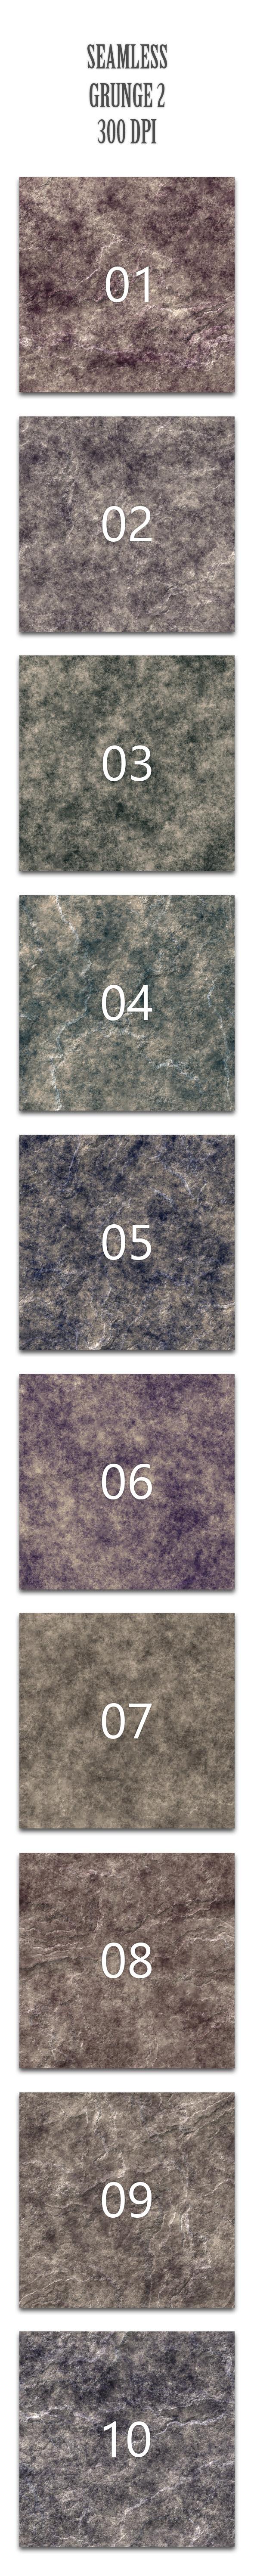 Seamless Grunge 2 - Textures / Fills / Patterns Photoshop